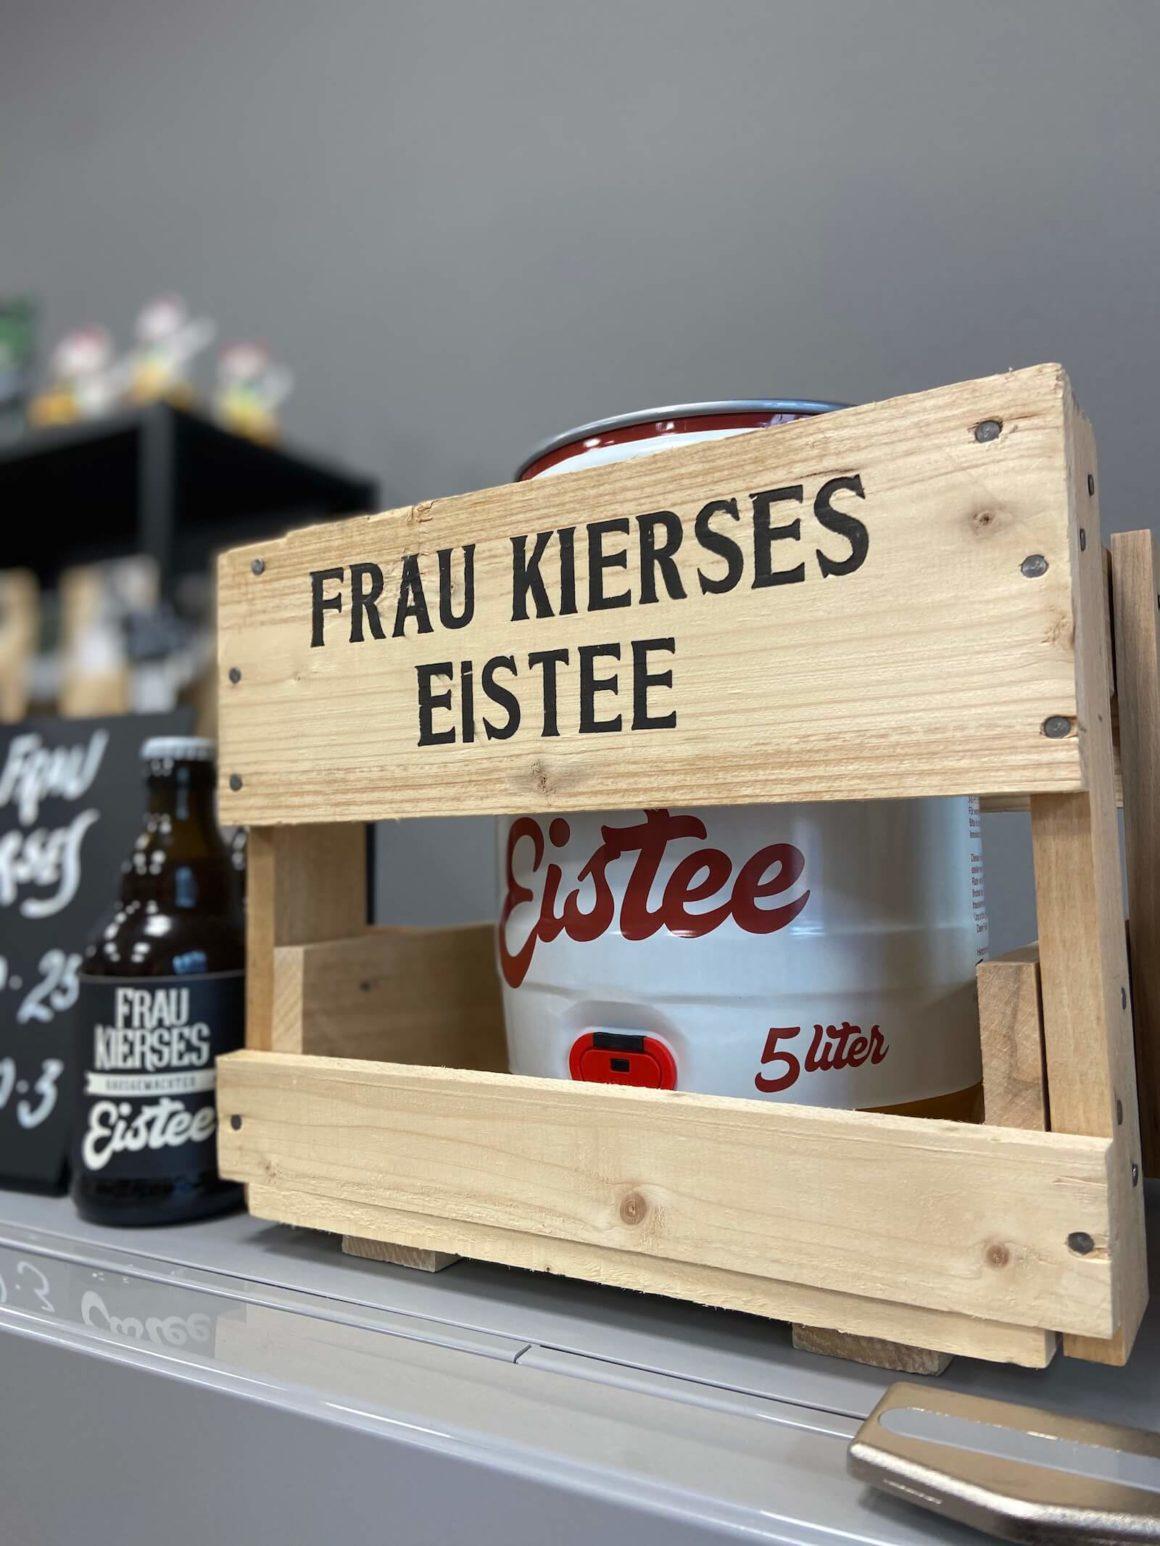 Frau Kierses Eistee Friedrichshain